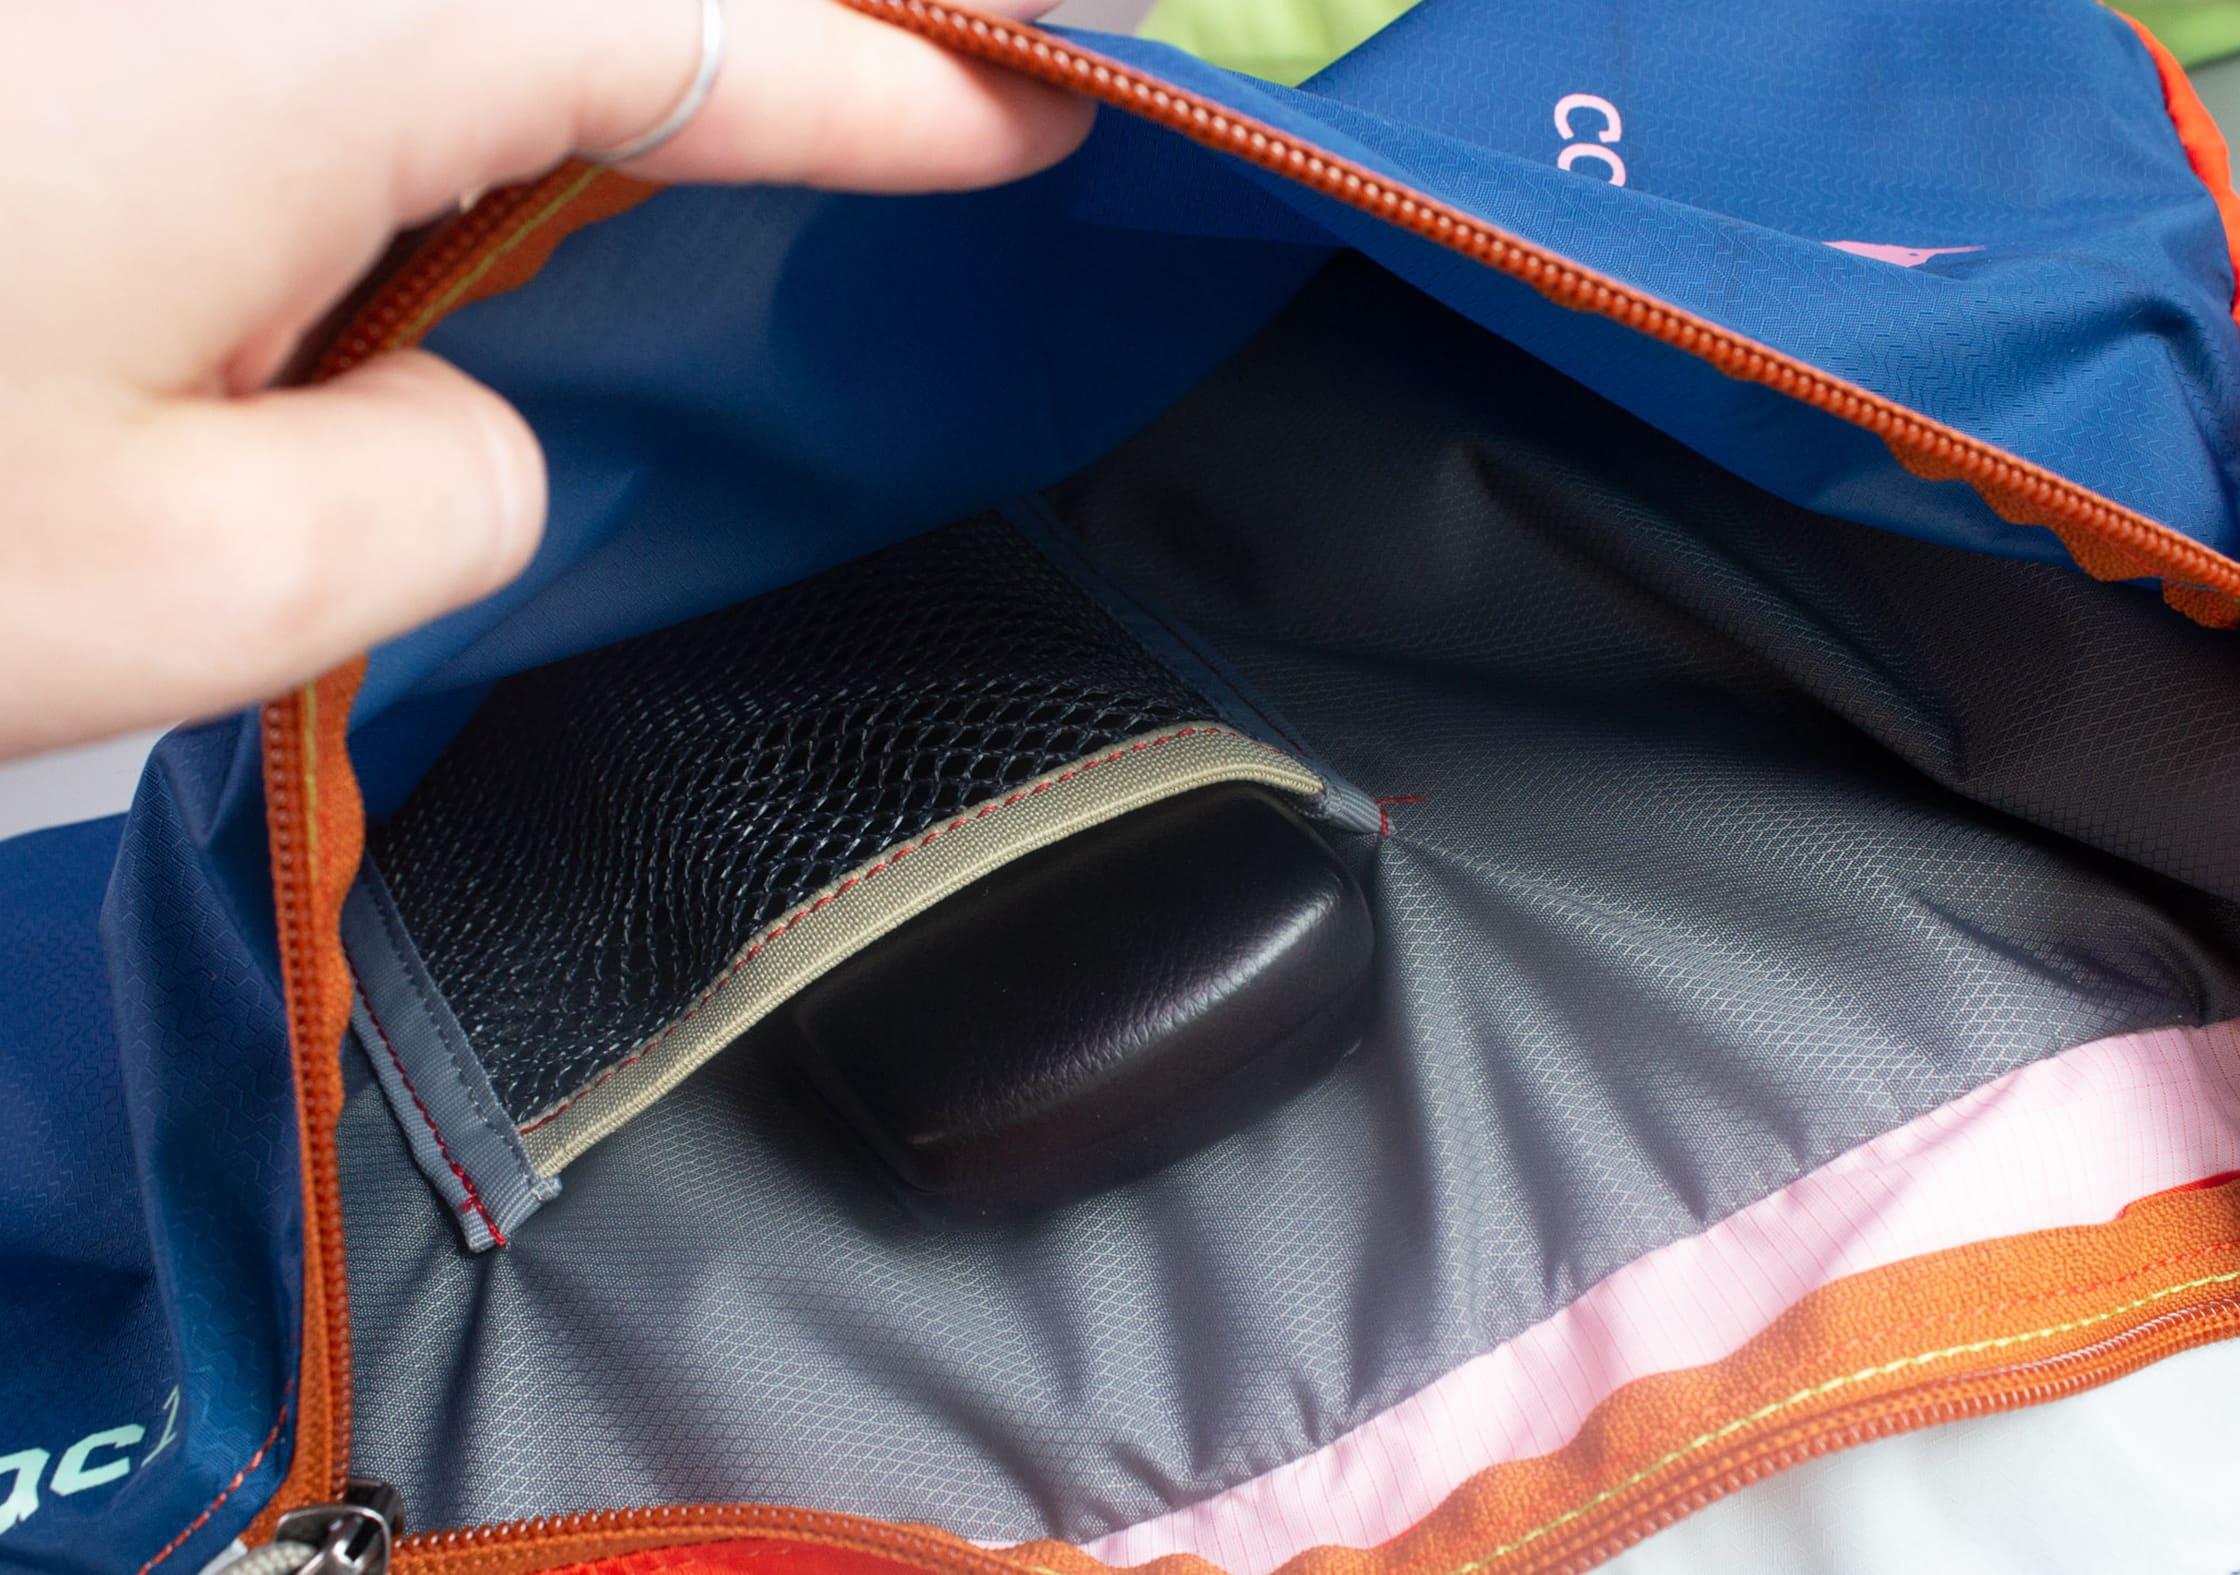 Cotopaxi Batac Front Compartment Small Square Pocket